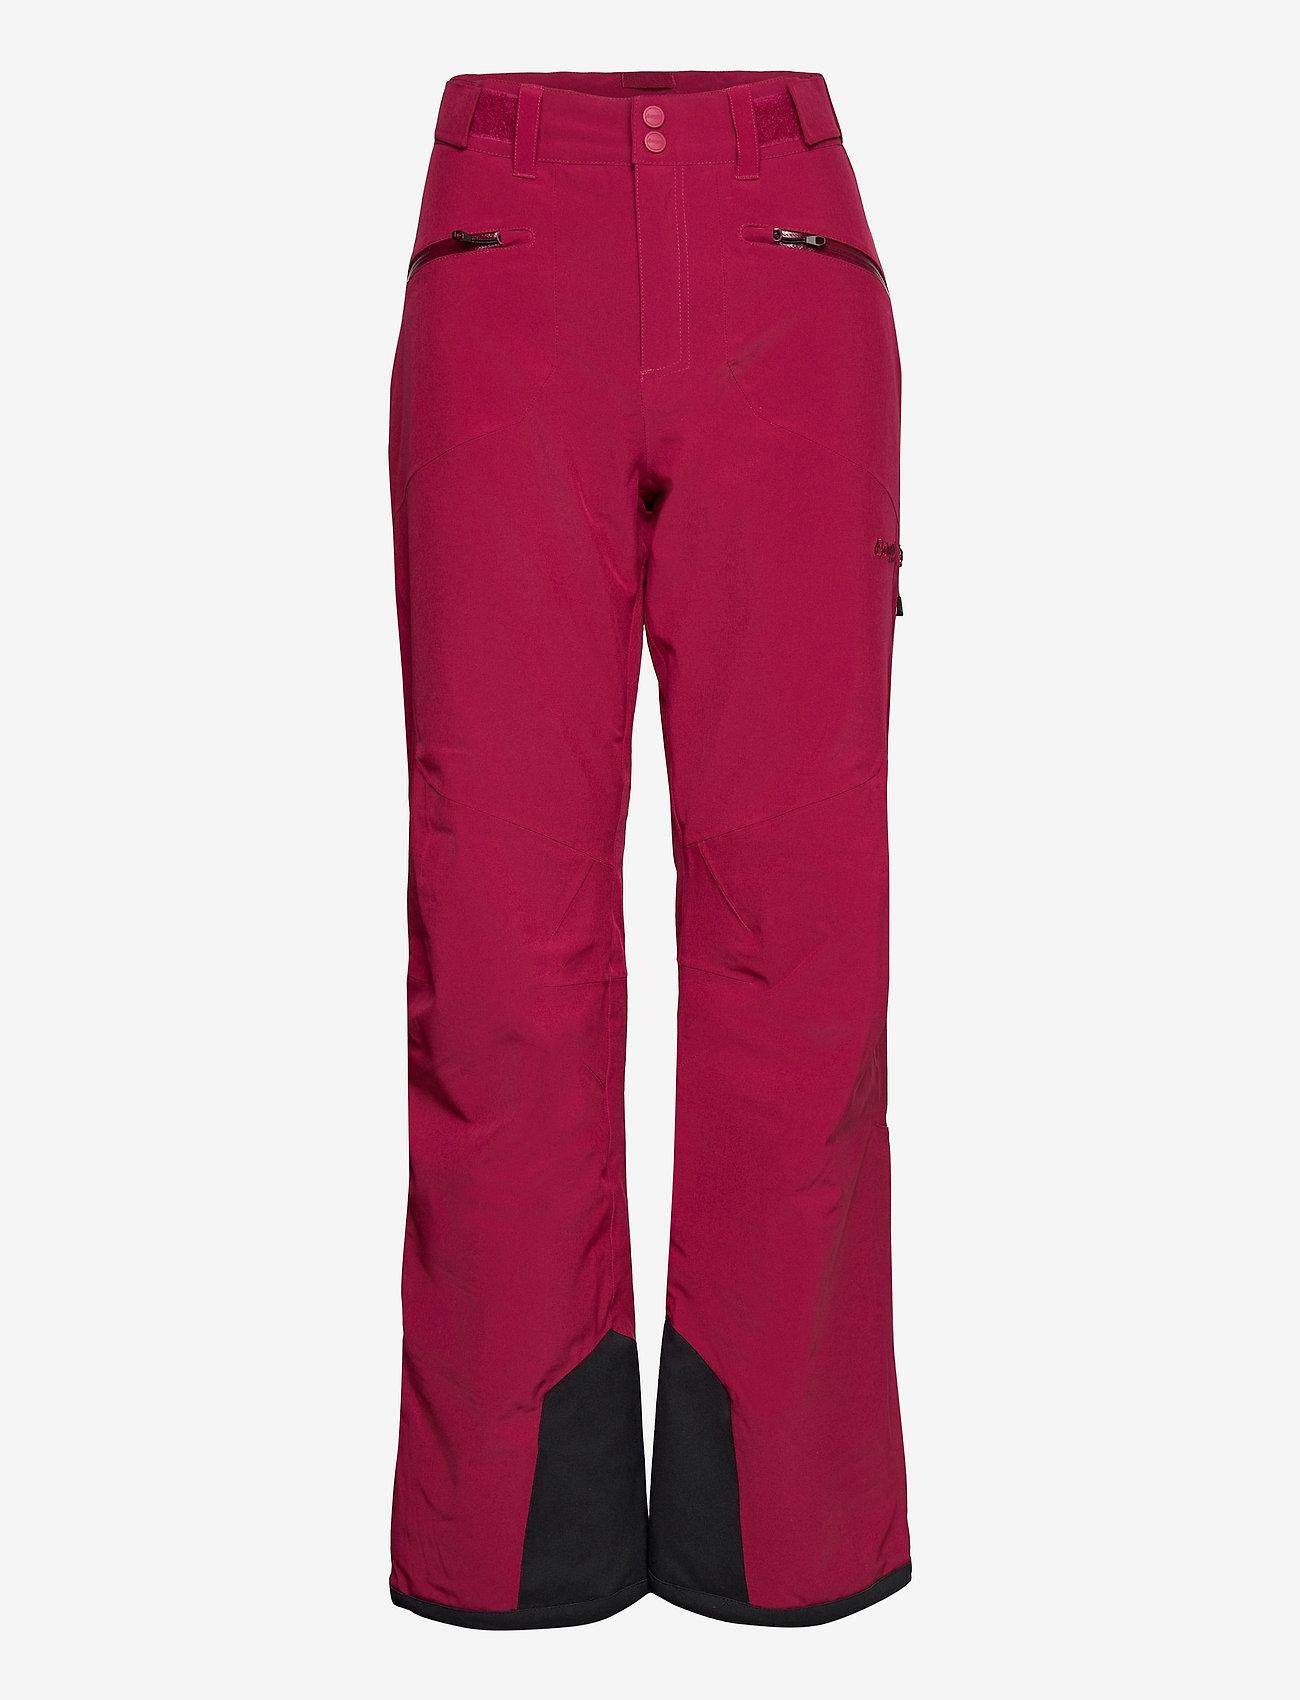 Bergans - Oppdal Insulated Lady Pnt - skibroeken - beetred - 0